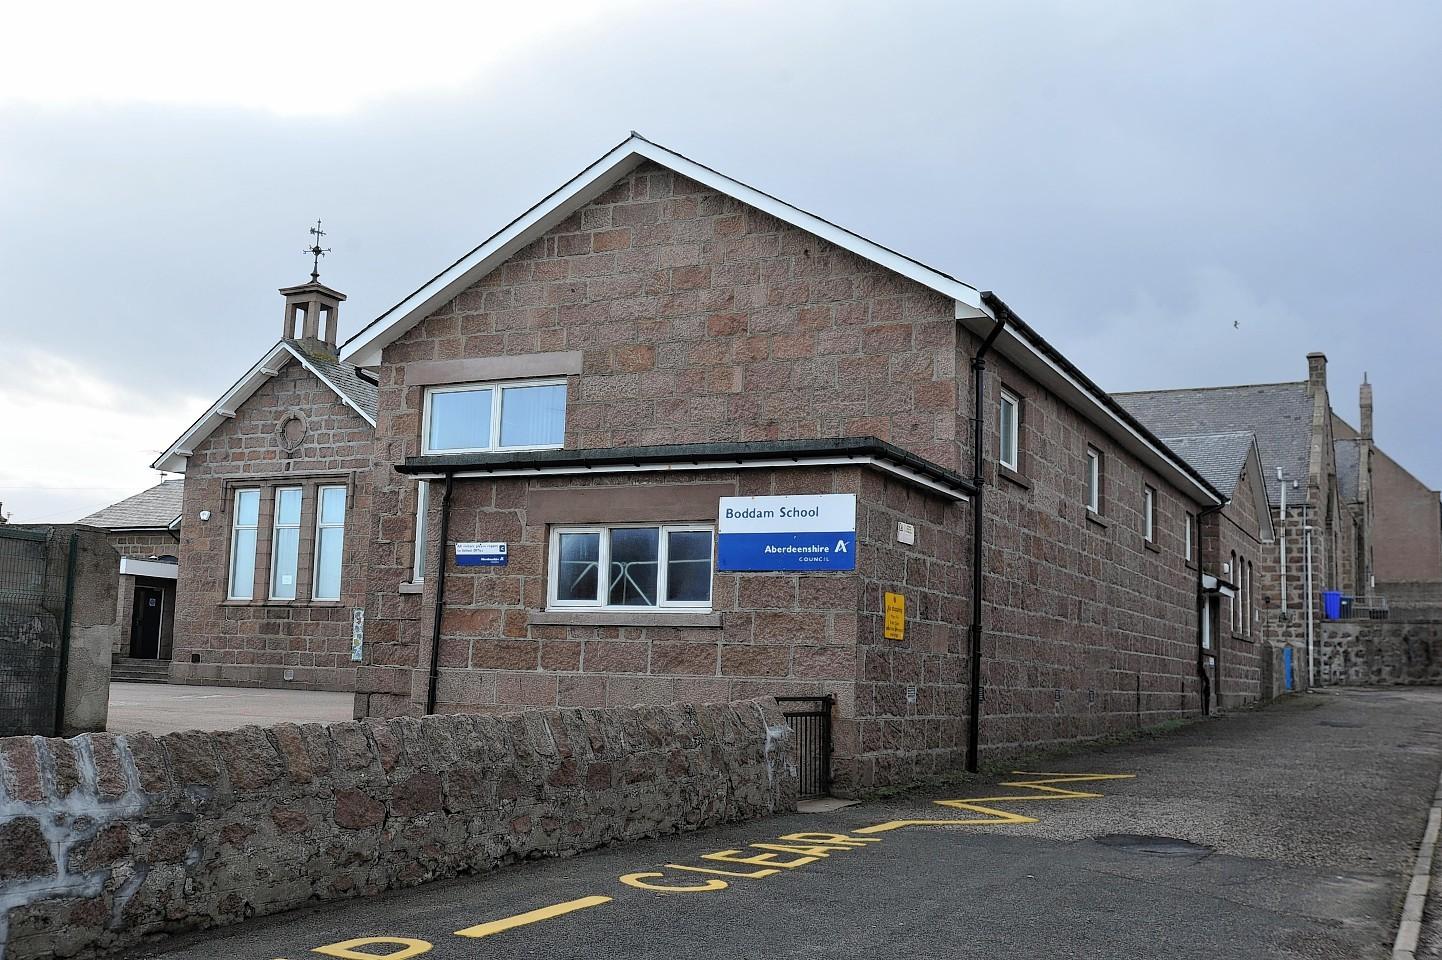 Boddam Primary School